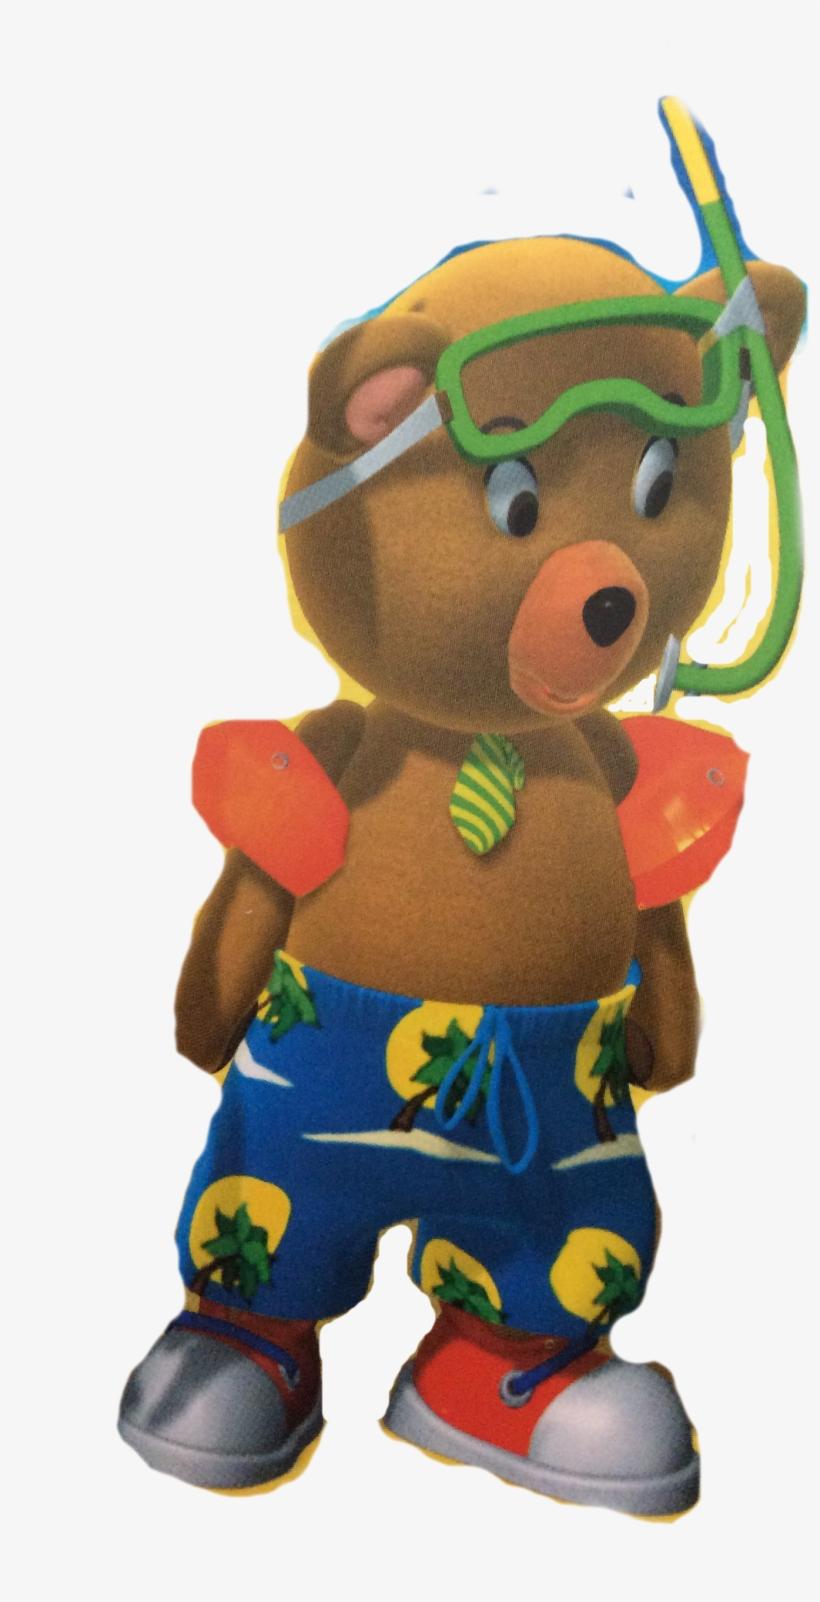 Master Tubby Bear Beach - Stuffed Toy@nicepng.com